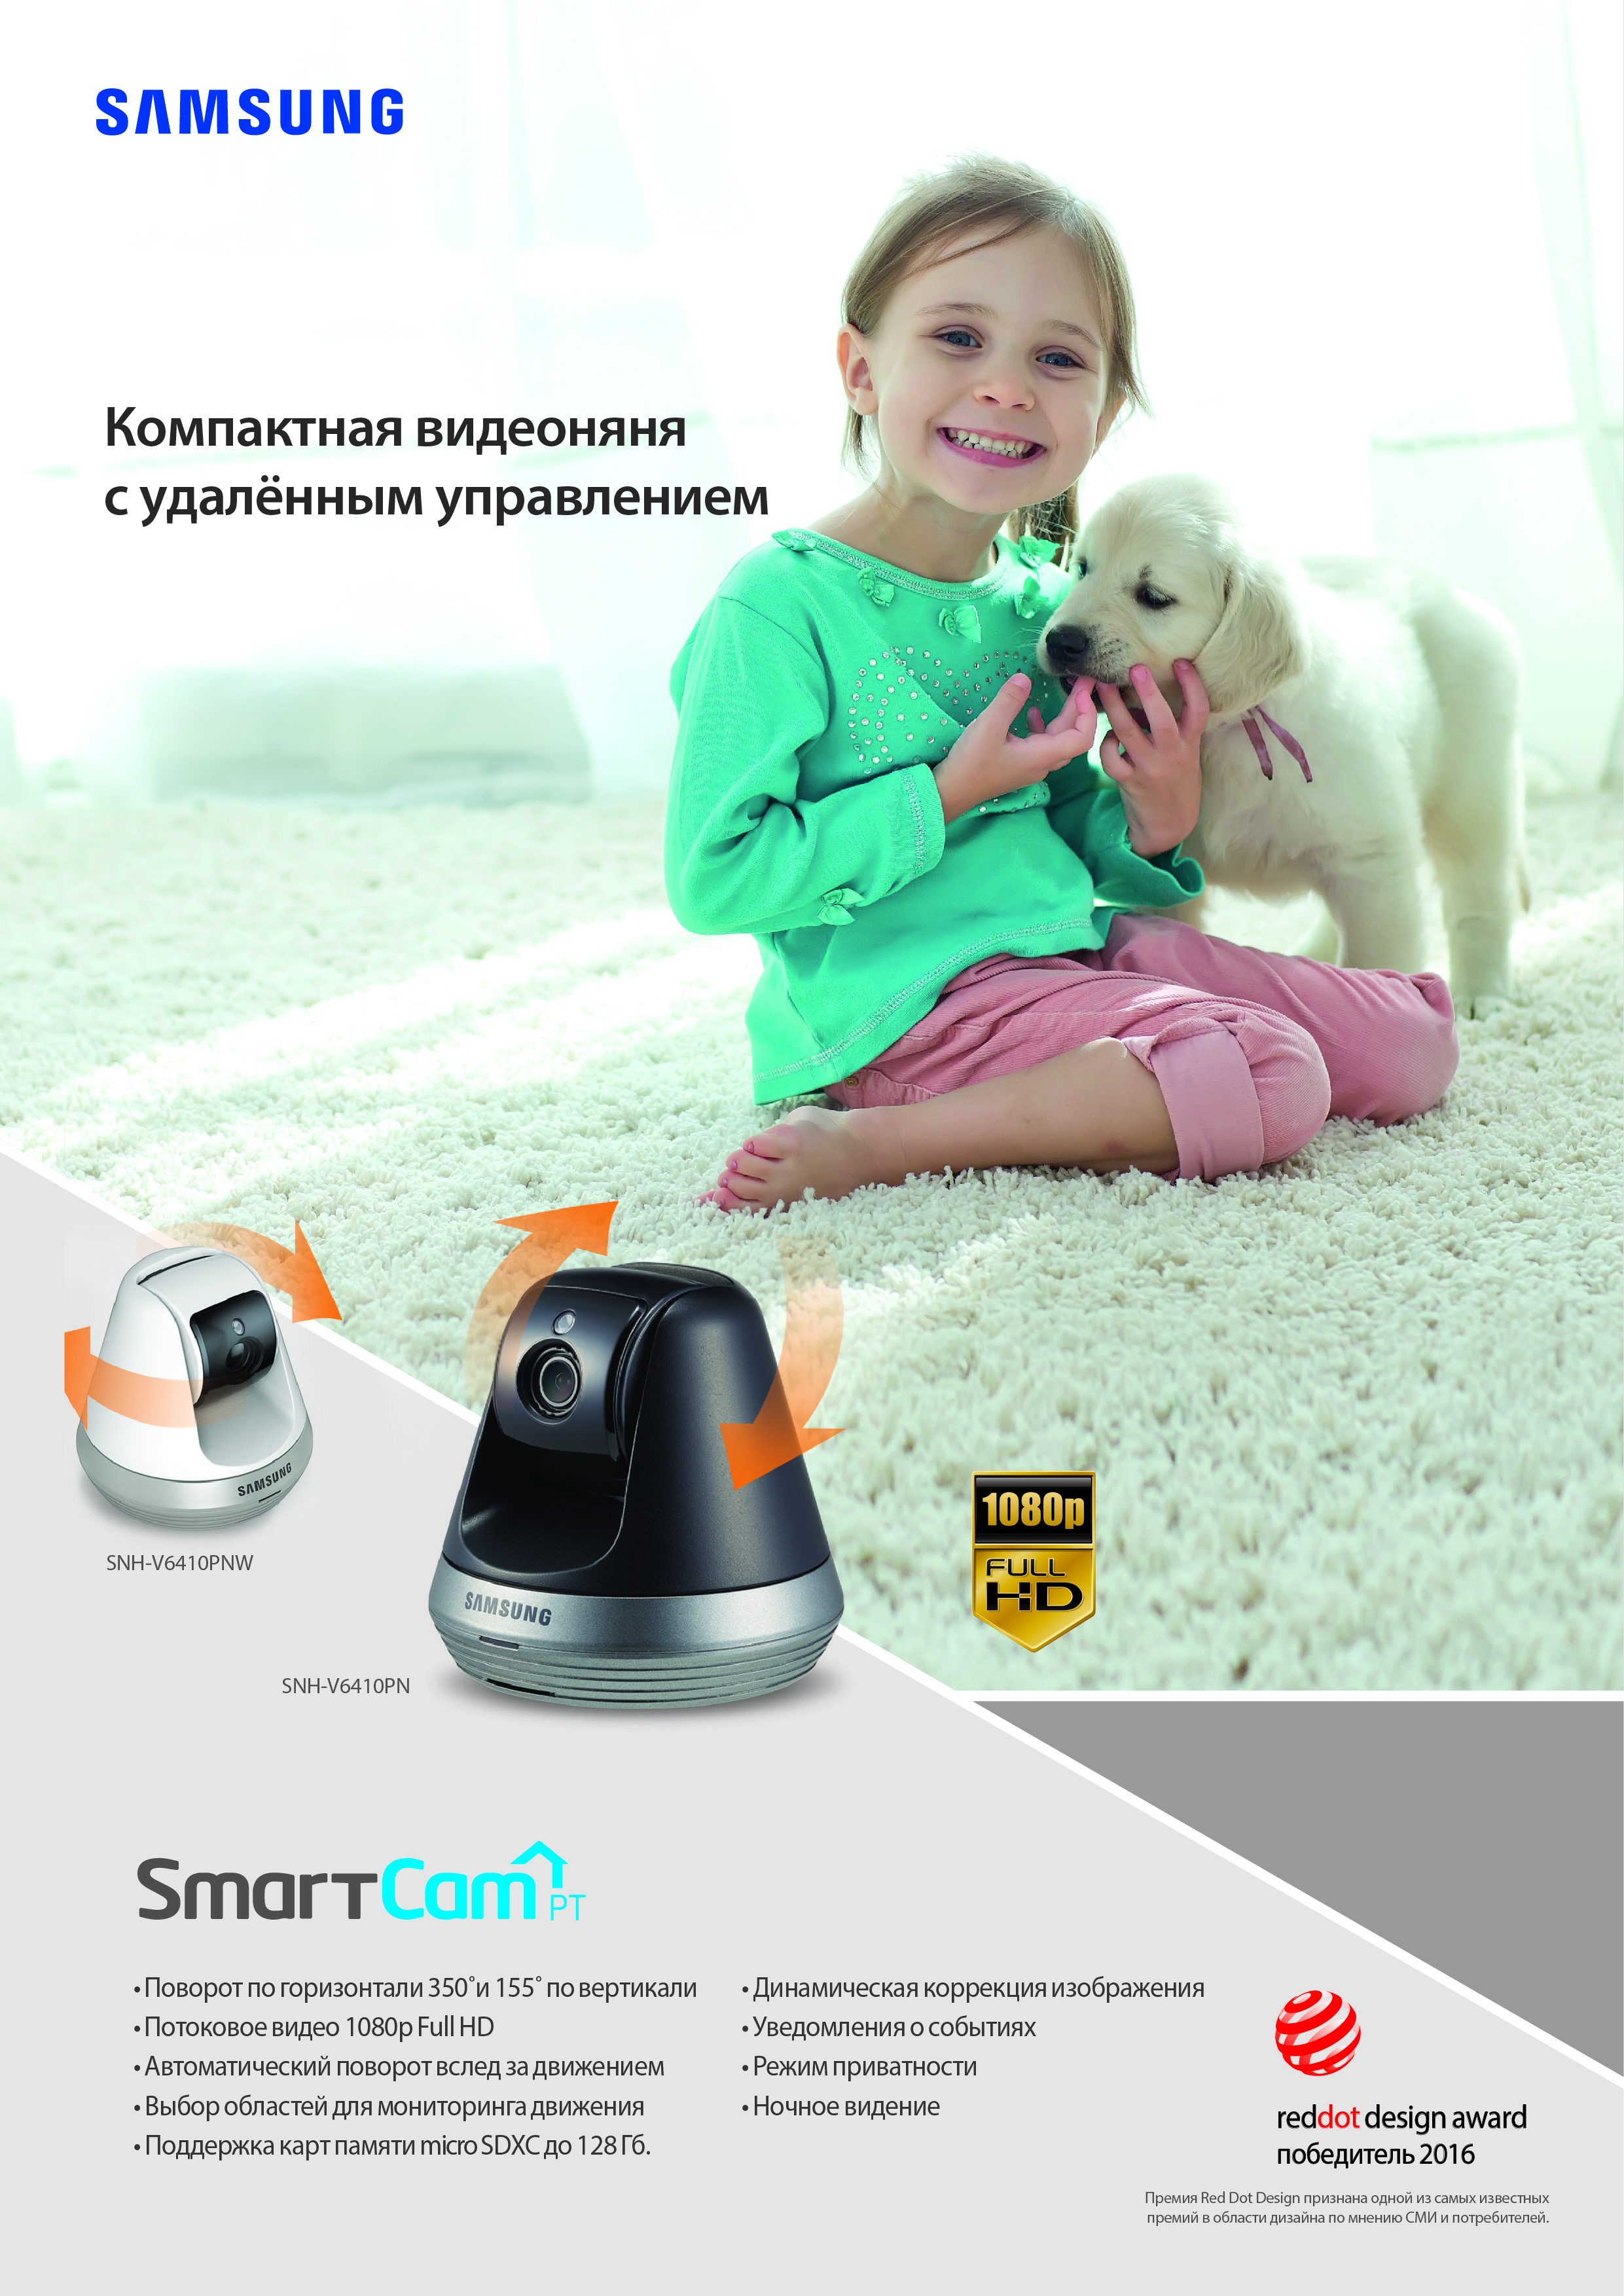 snh-v6410pn-pnw-ru-web-01.jpg